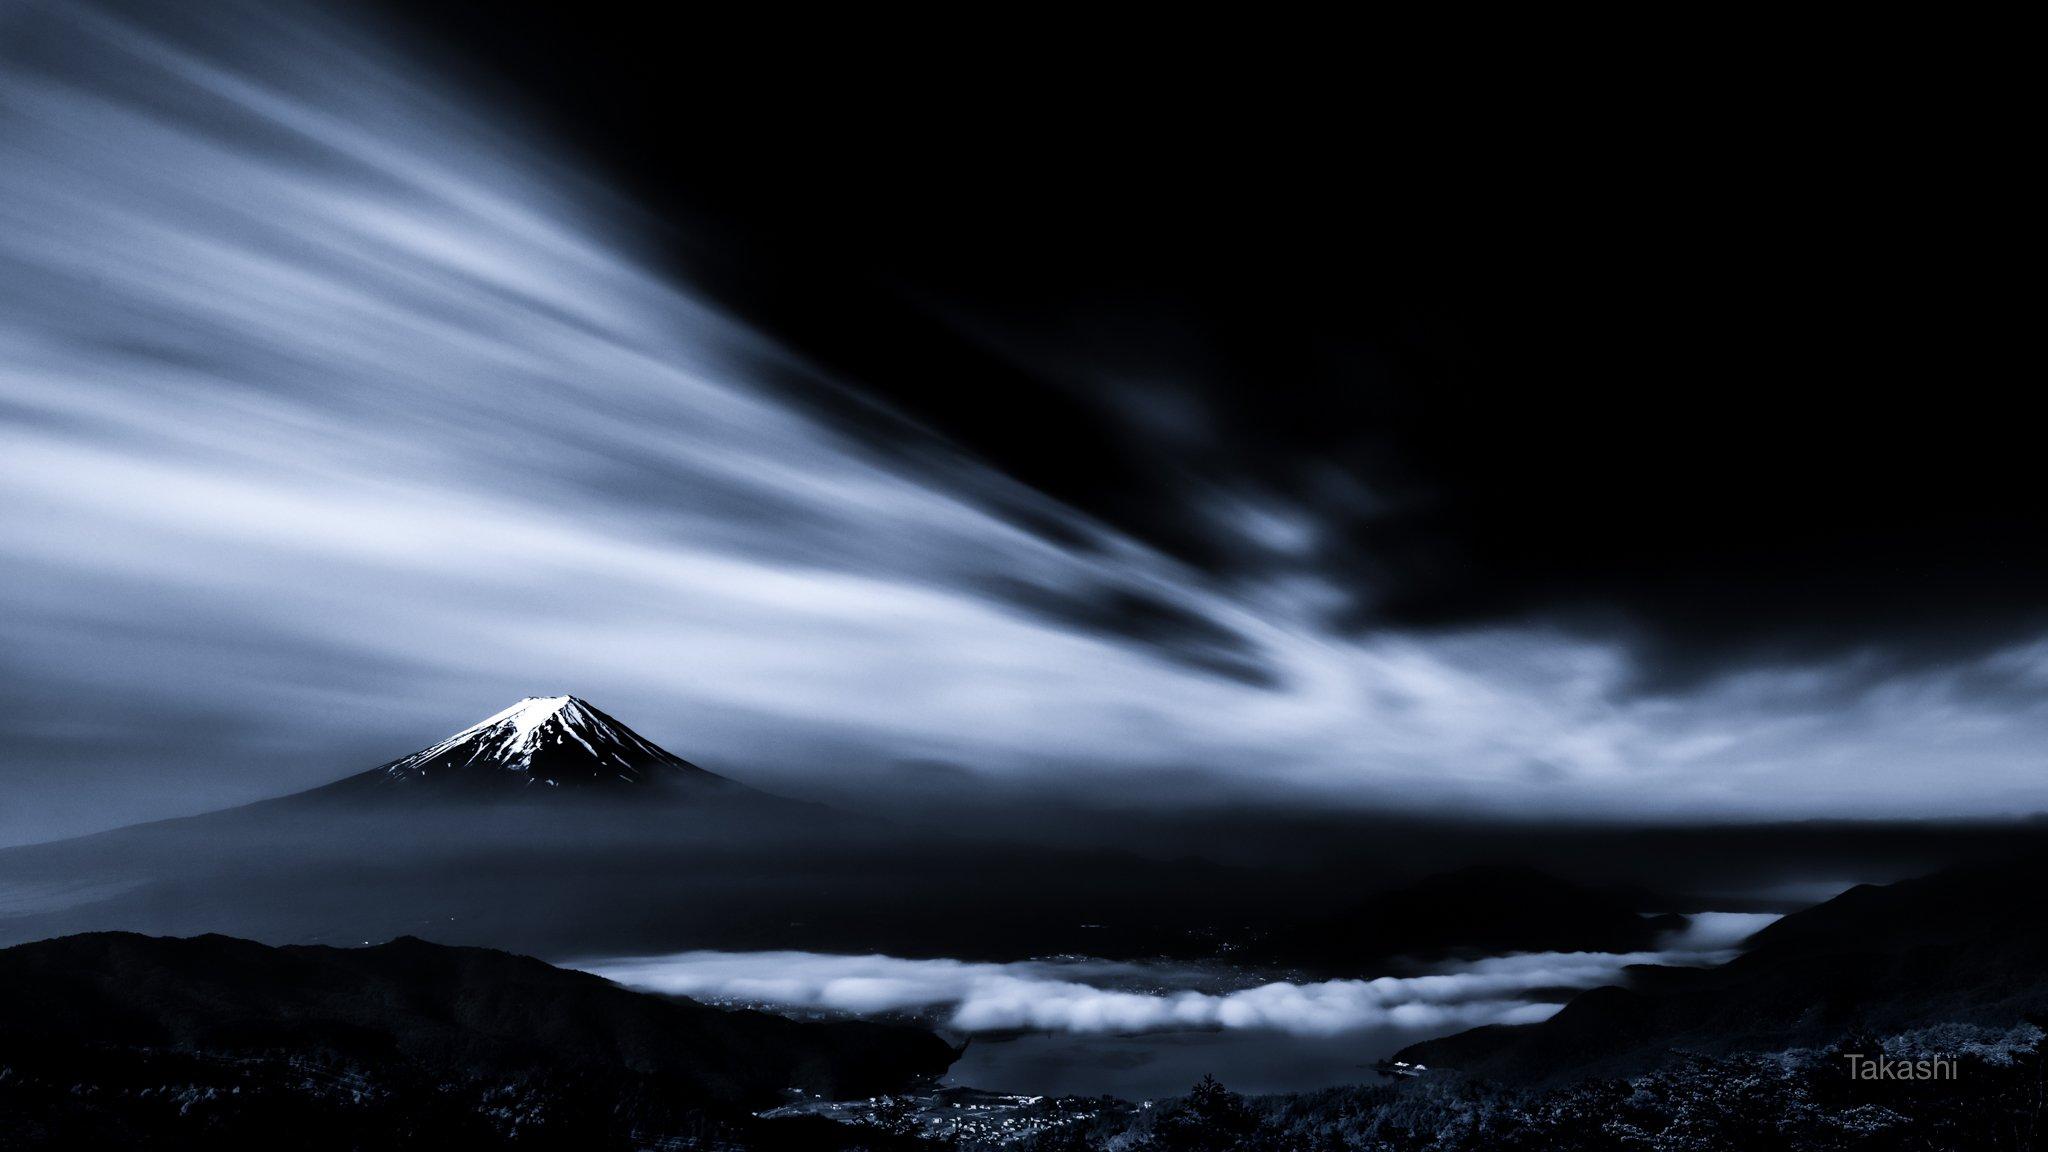 Fuji,mountain,Japan,clouds,sky,lake,snow,blue,landscape,beautiful,wonderful,, Takashi